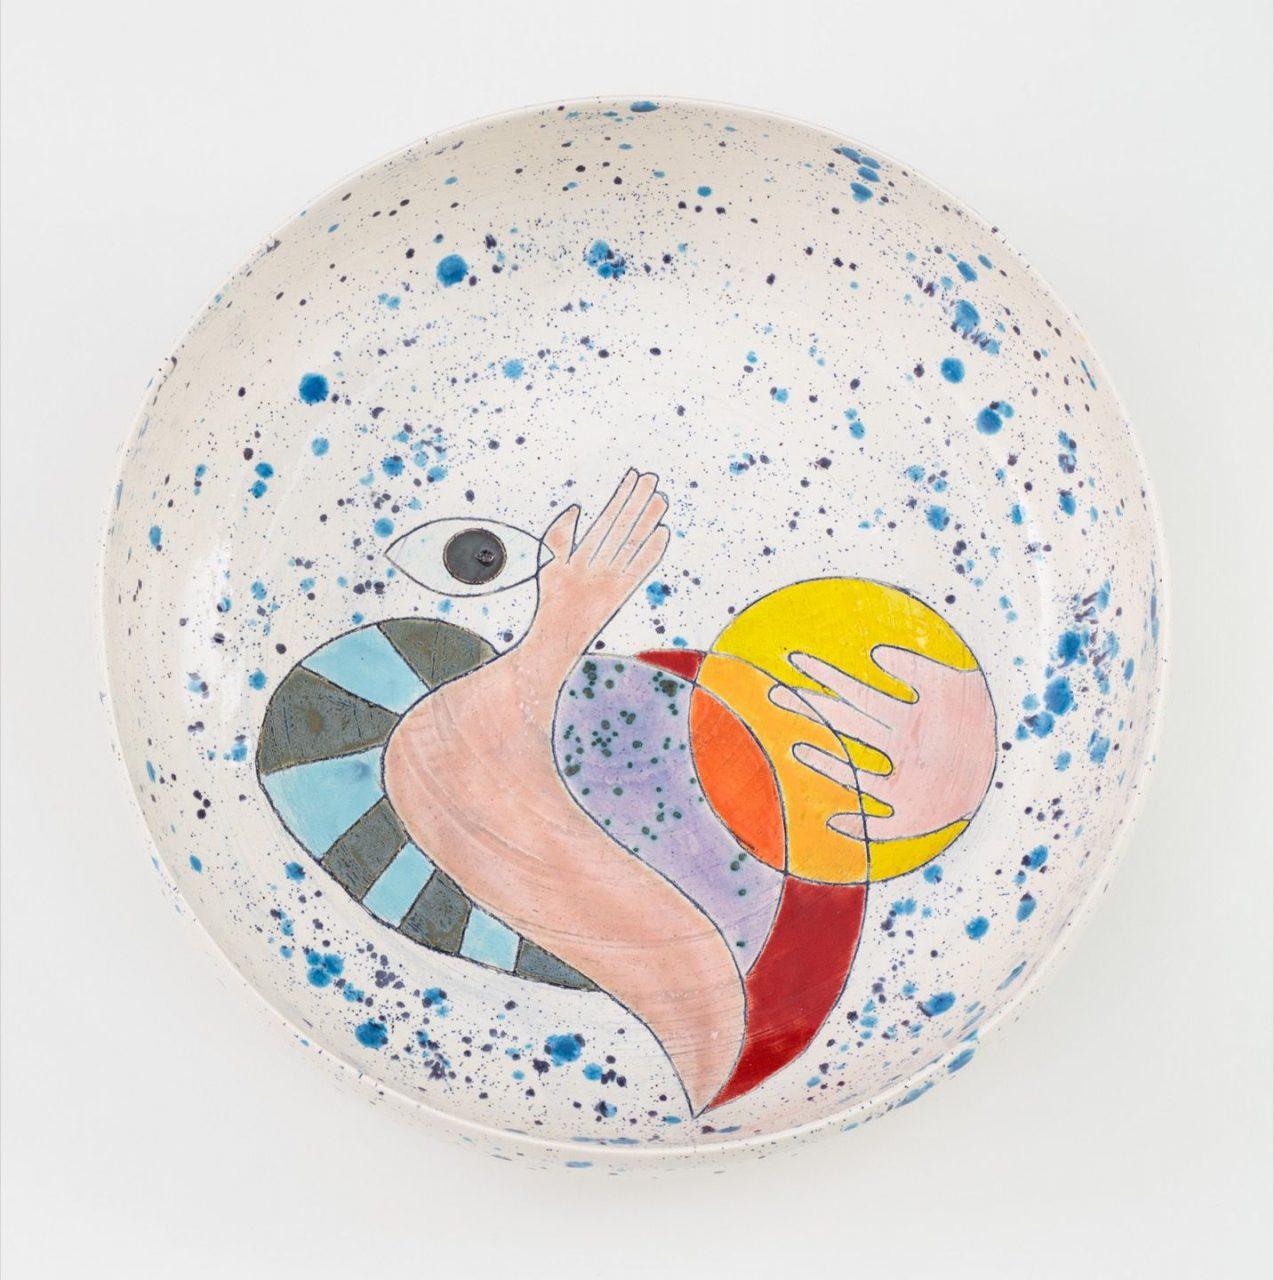 Bruce M. Sherman | Large Bowl (White), 2016